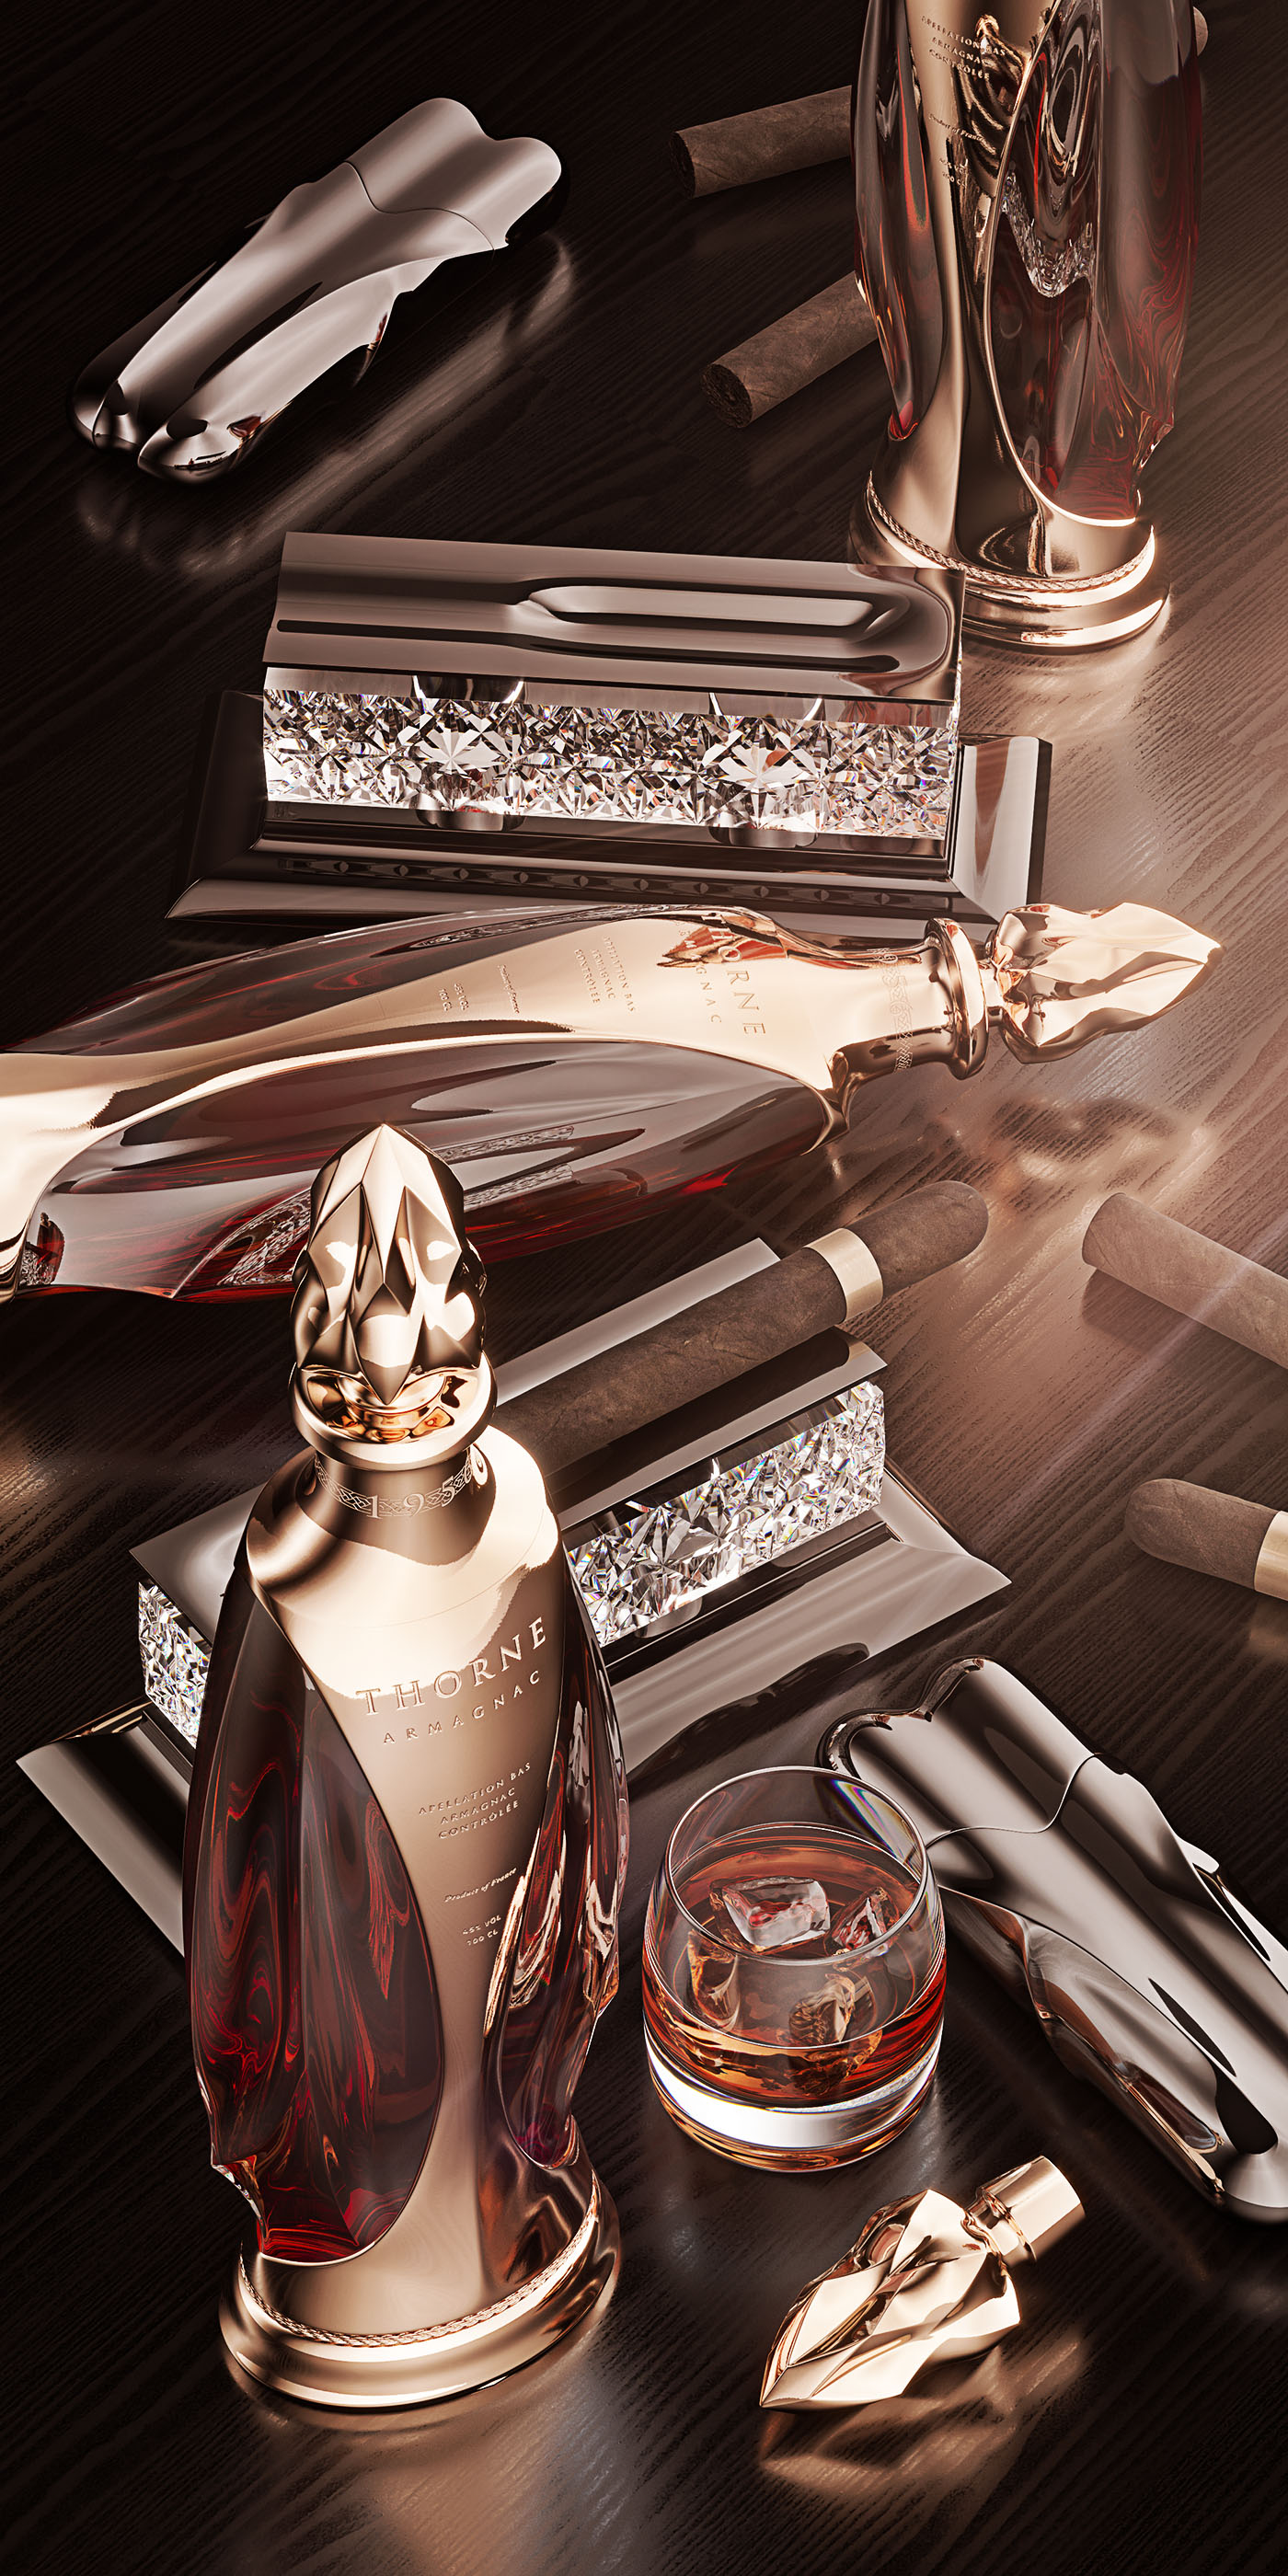 Thorne luxury armagnac bottle 7.jpg